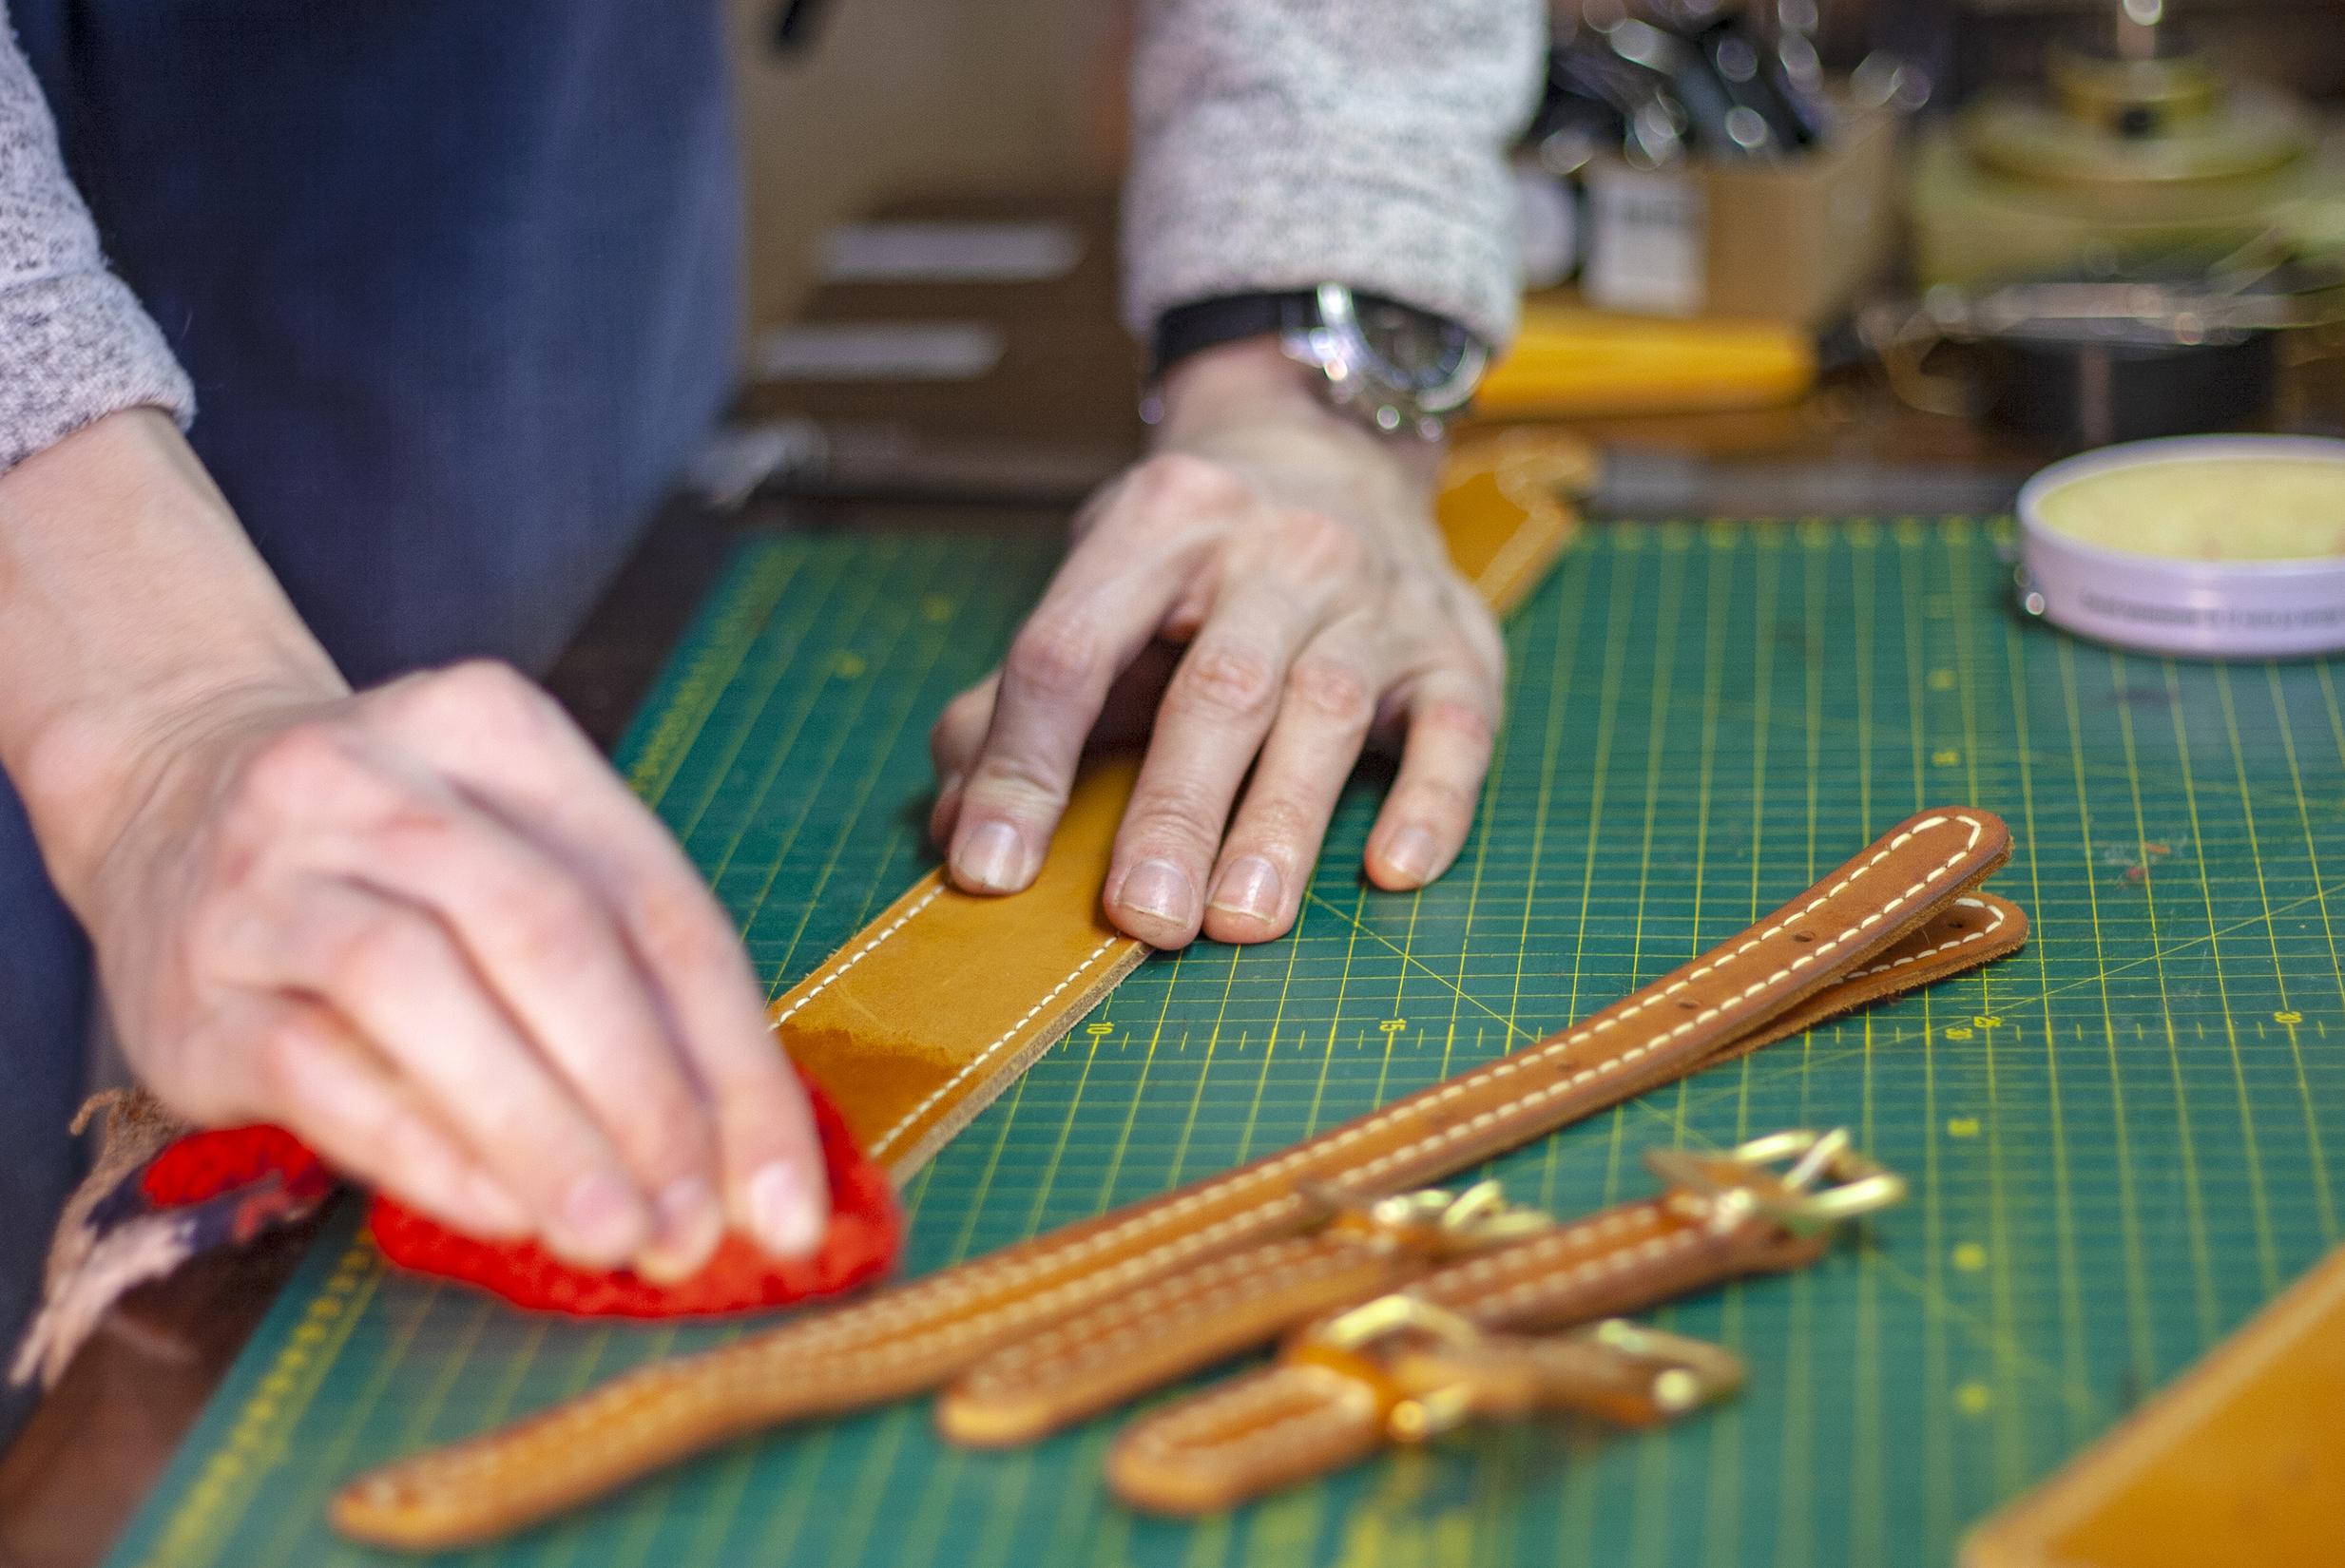 leather-work-istock-1164941153.jpg